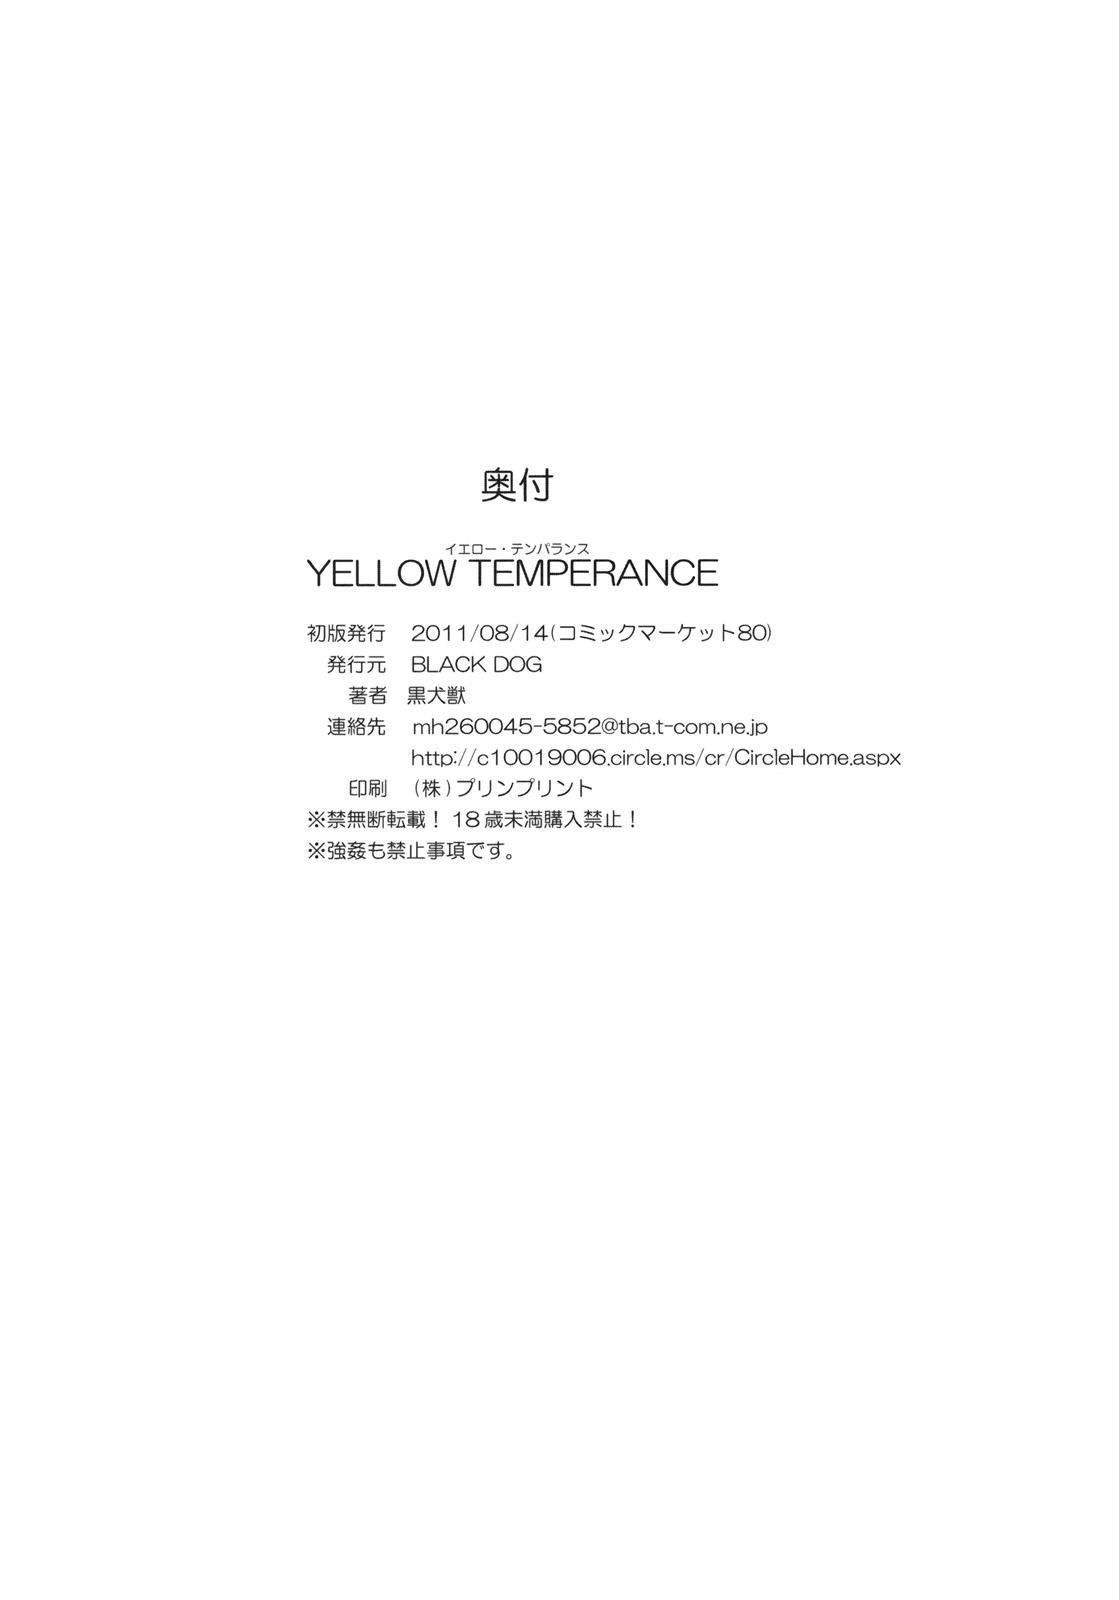 YELLOW TEMPERANCE 52